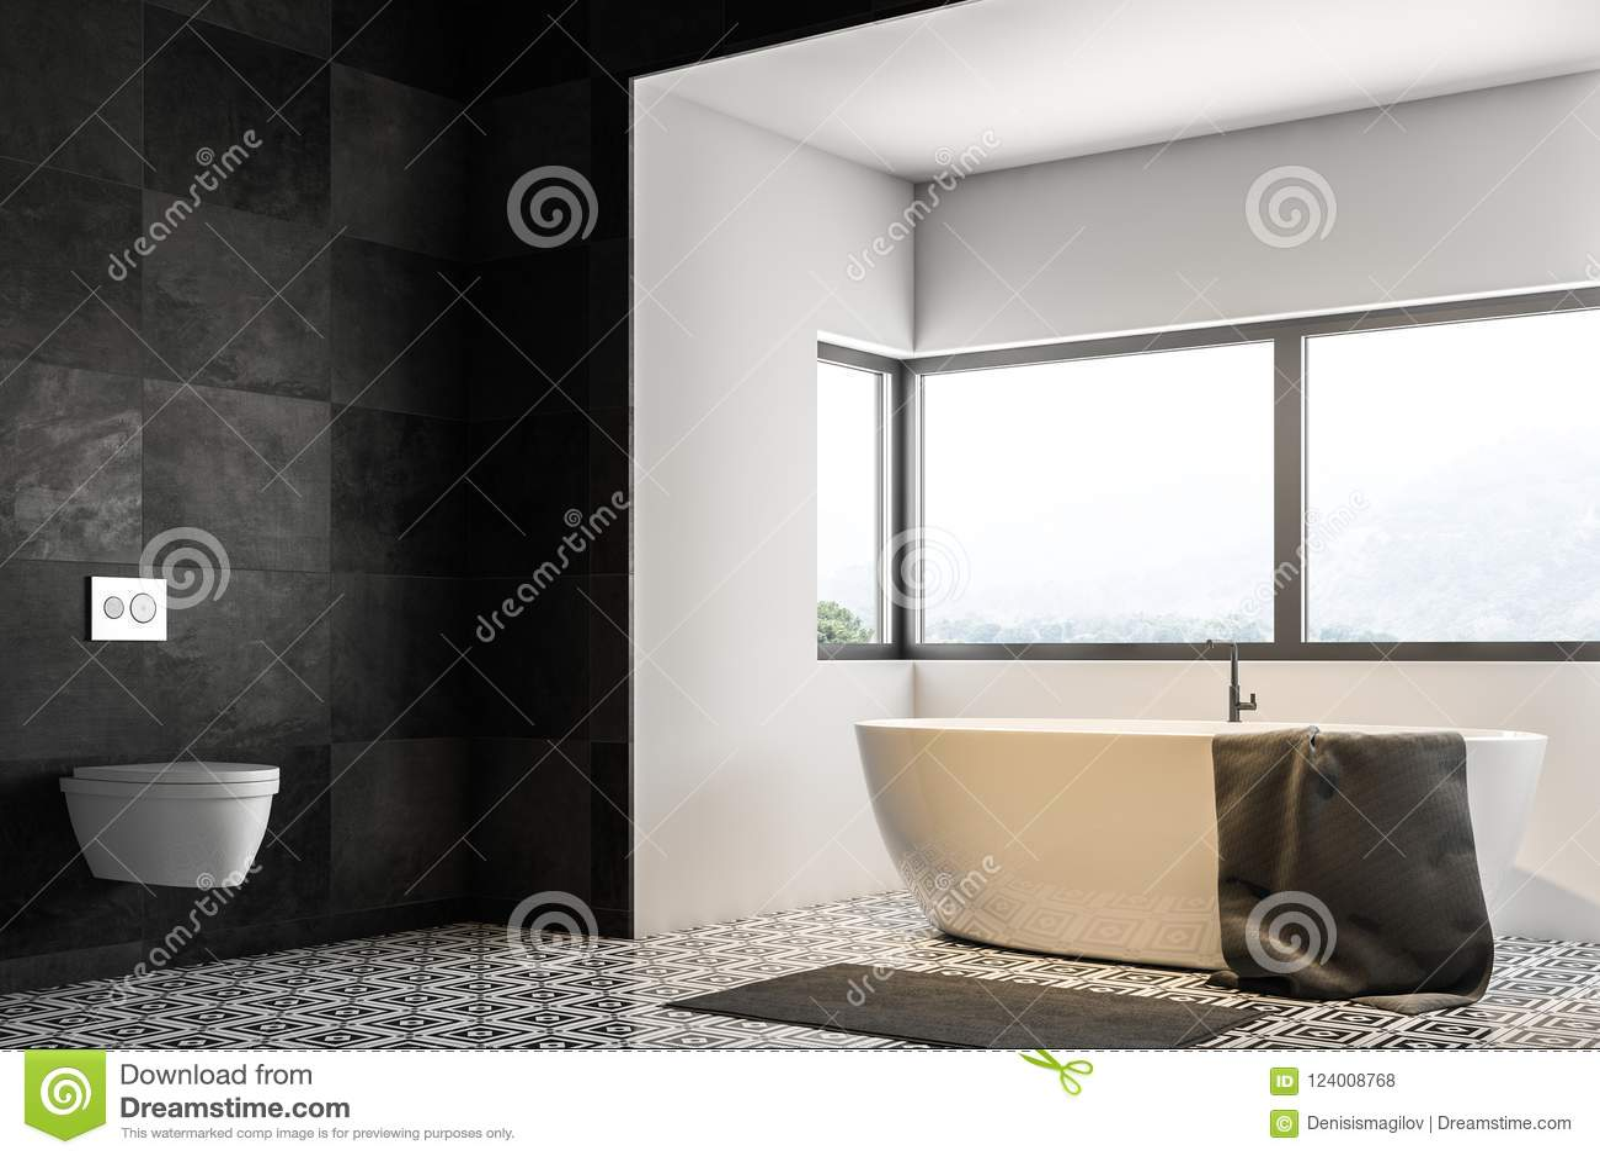 Black Tile Bathroom Corner, Tub And Sink Stock Illustration ...